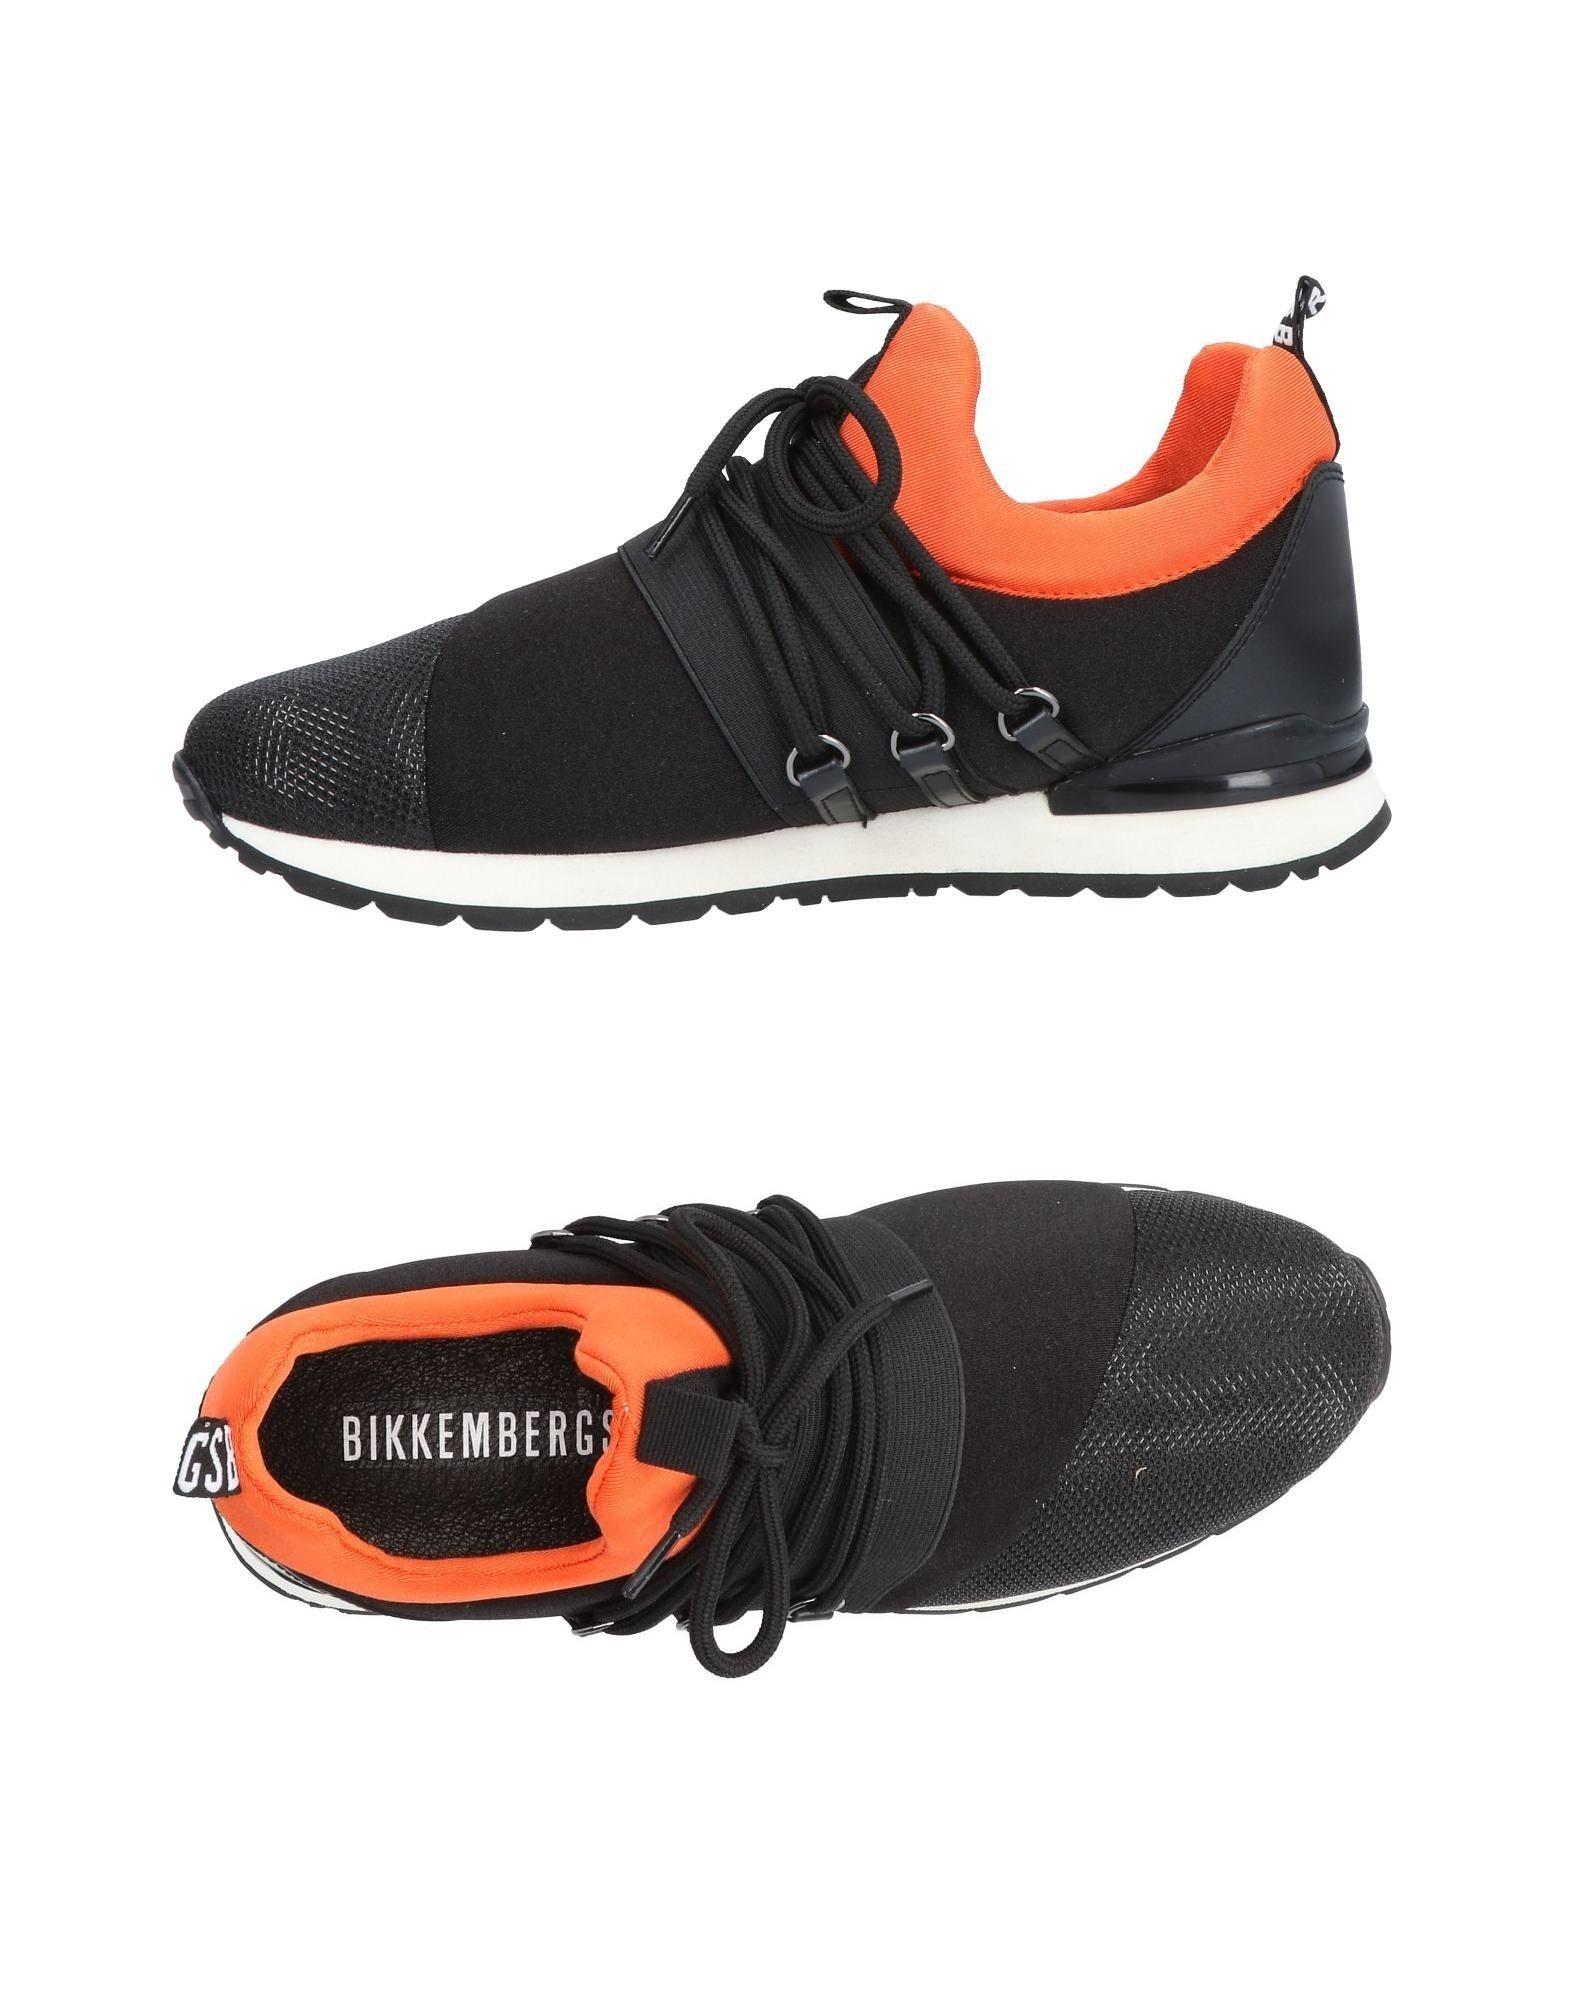 Bikkembergs Sneakers Damen Damen Sneakers  11449823UC be9894